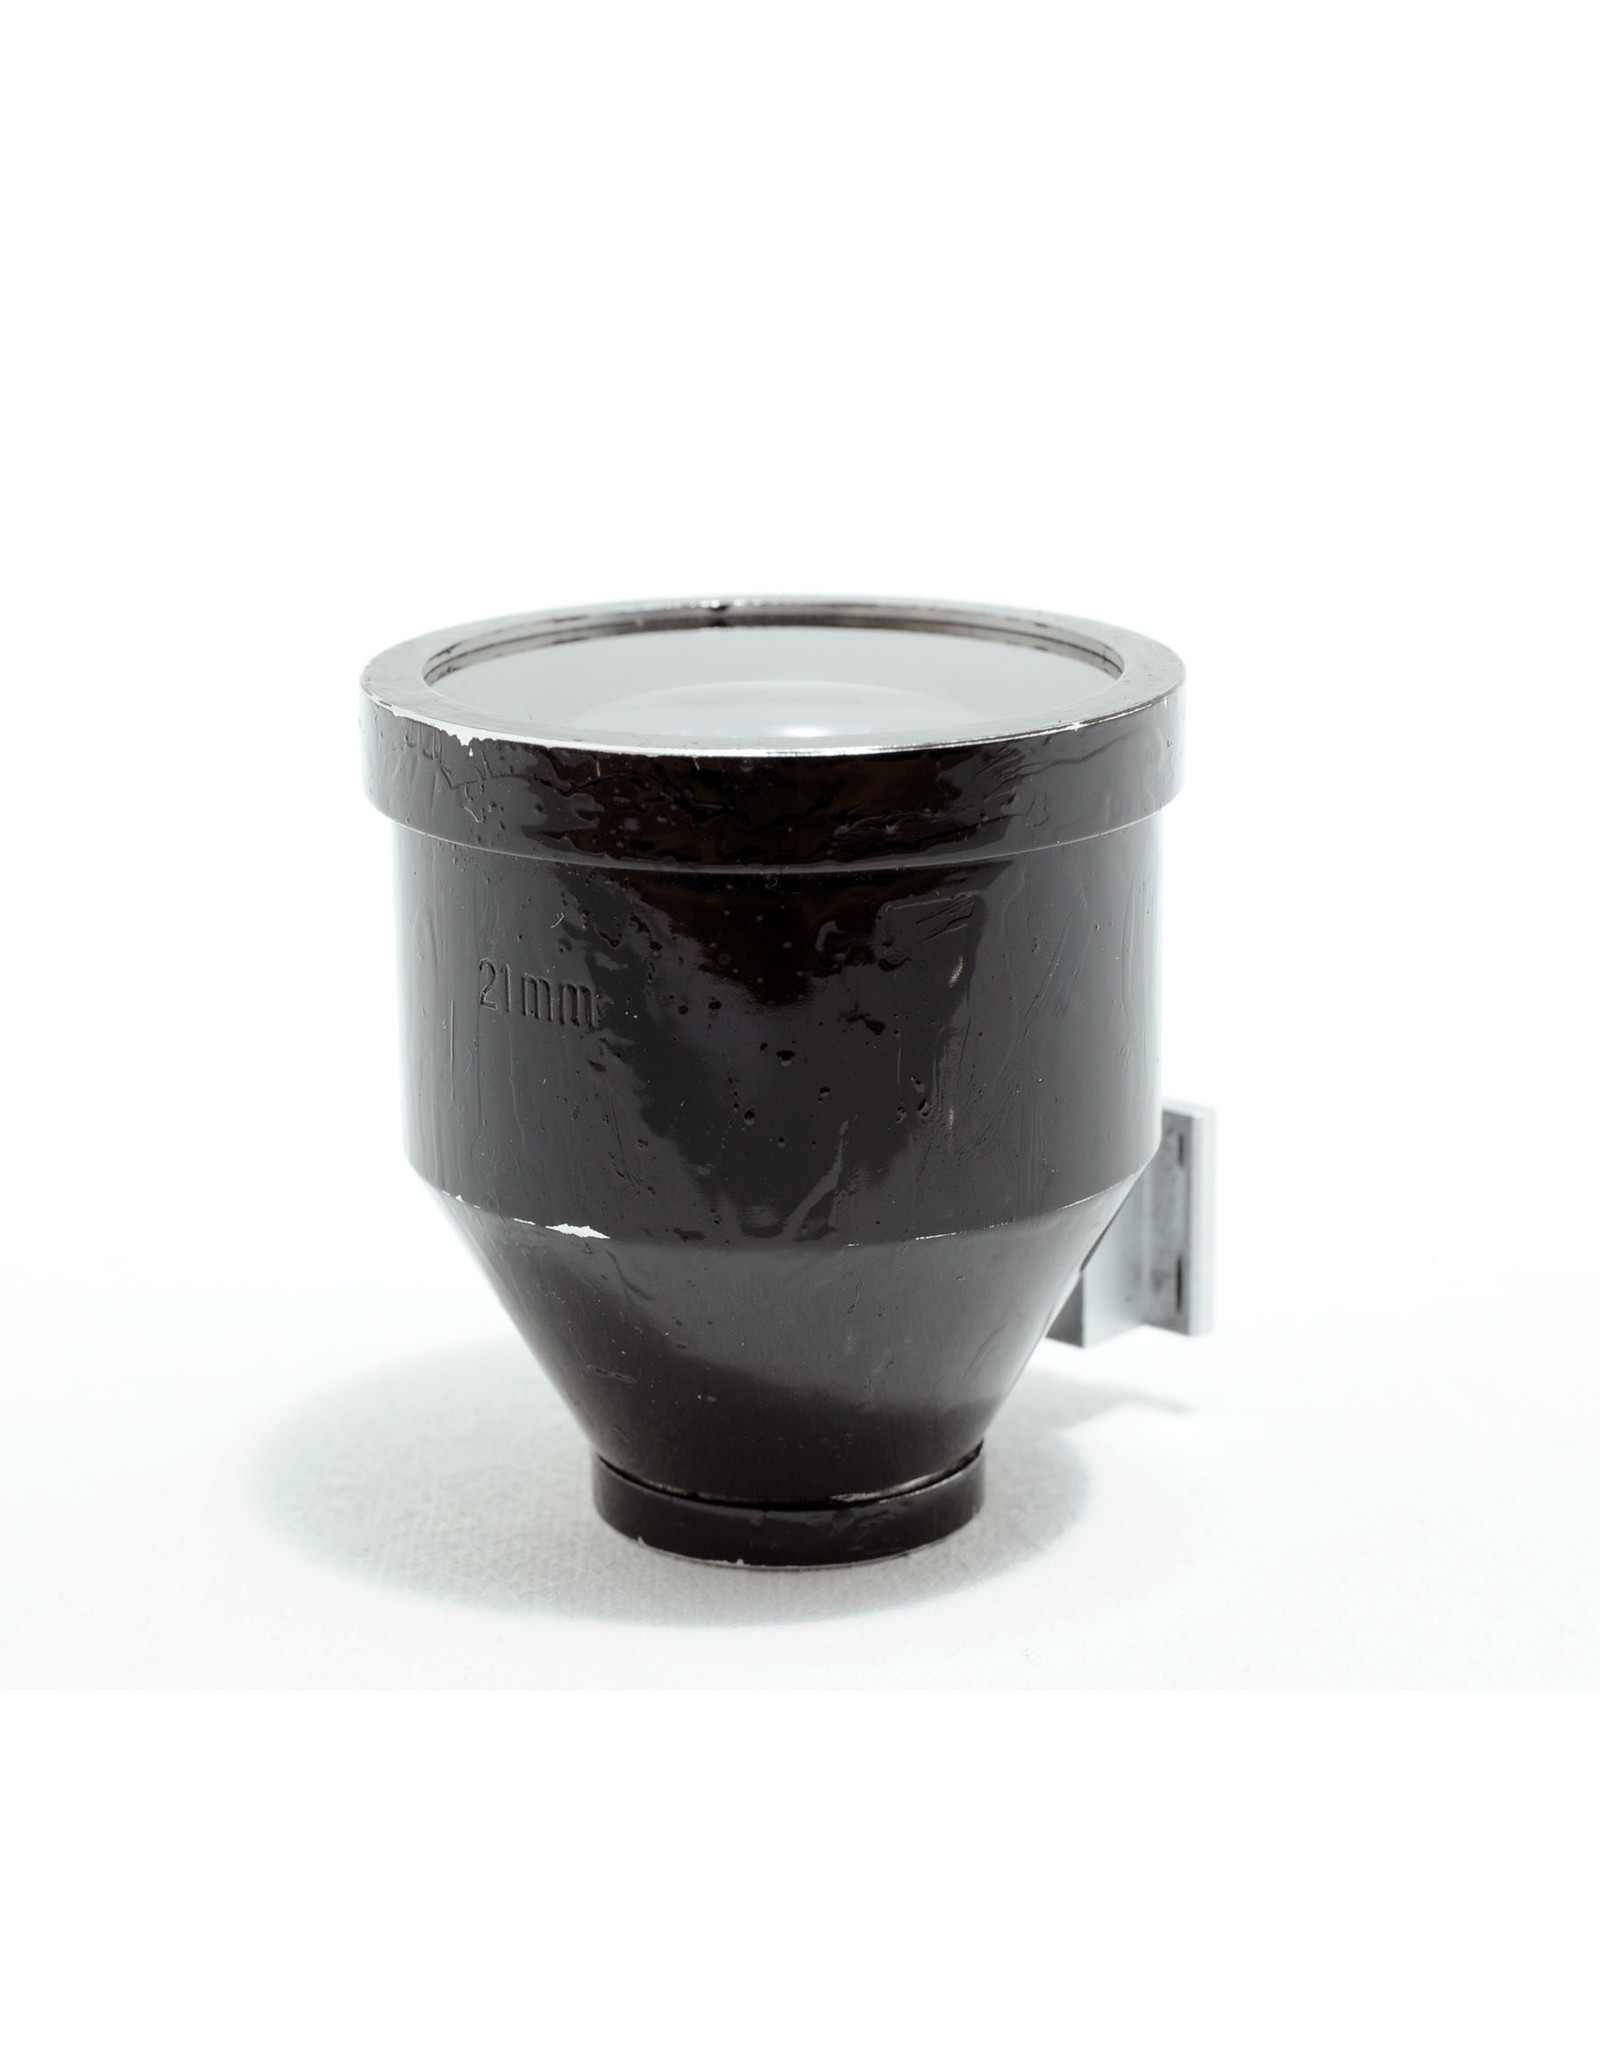 Pasoptik Pasoptik 21mm V/finder  Painted in Gloss black